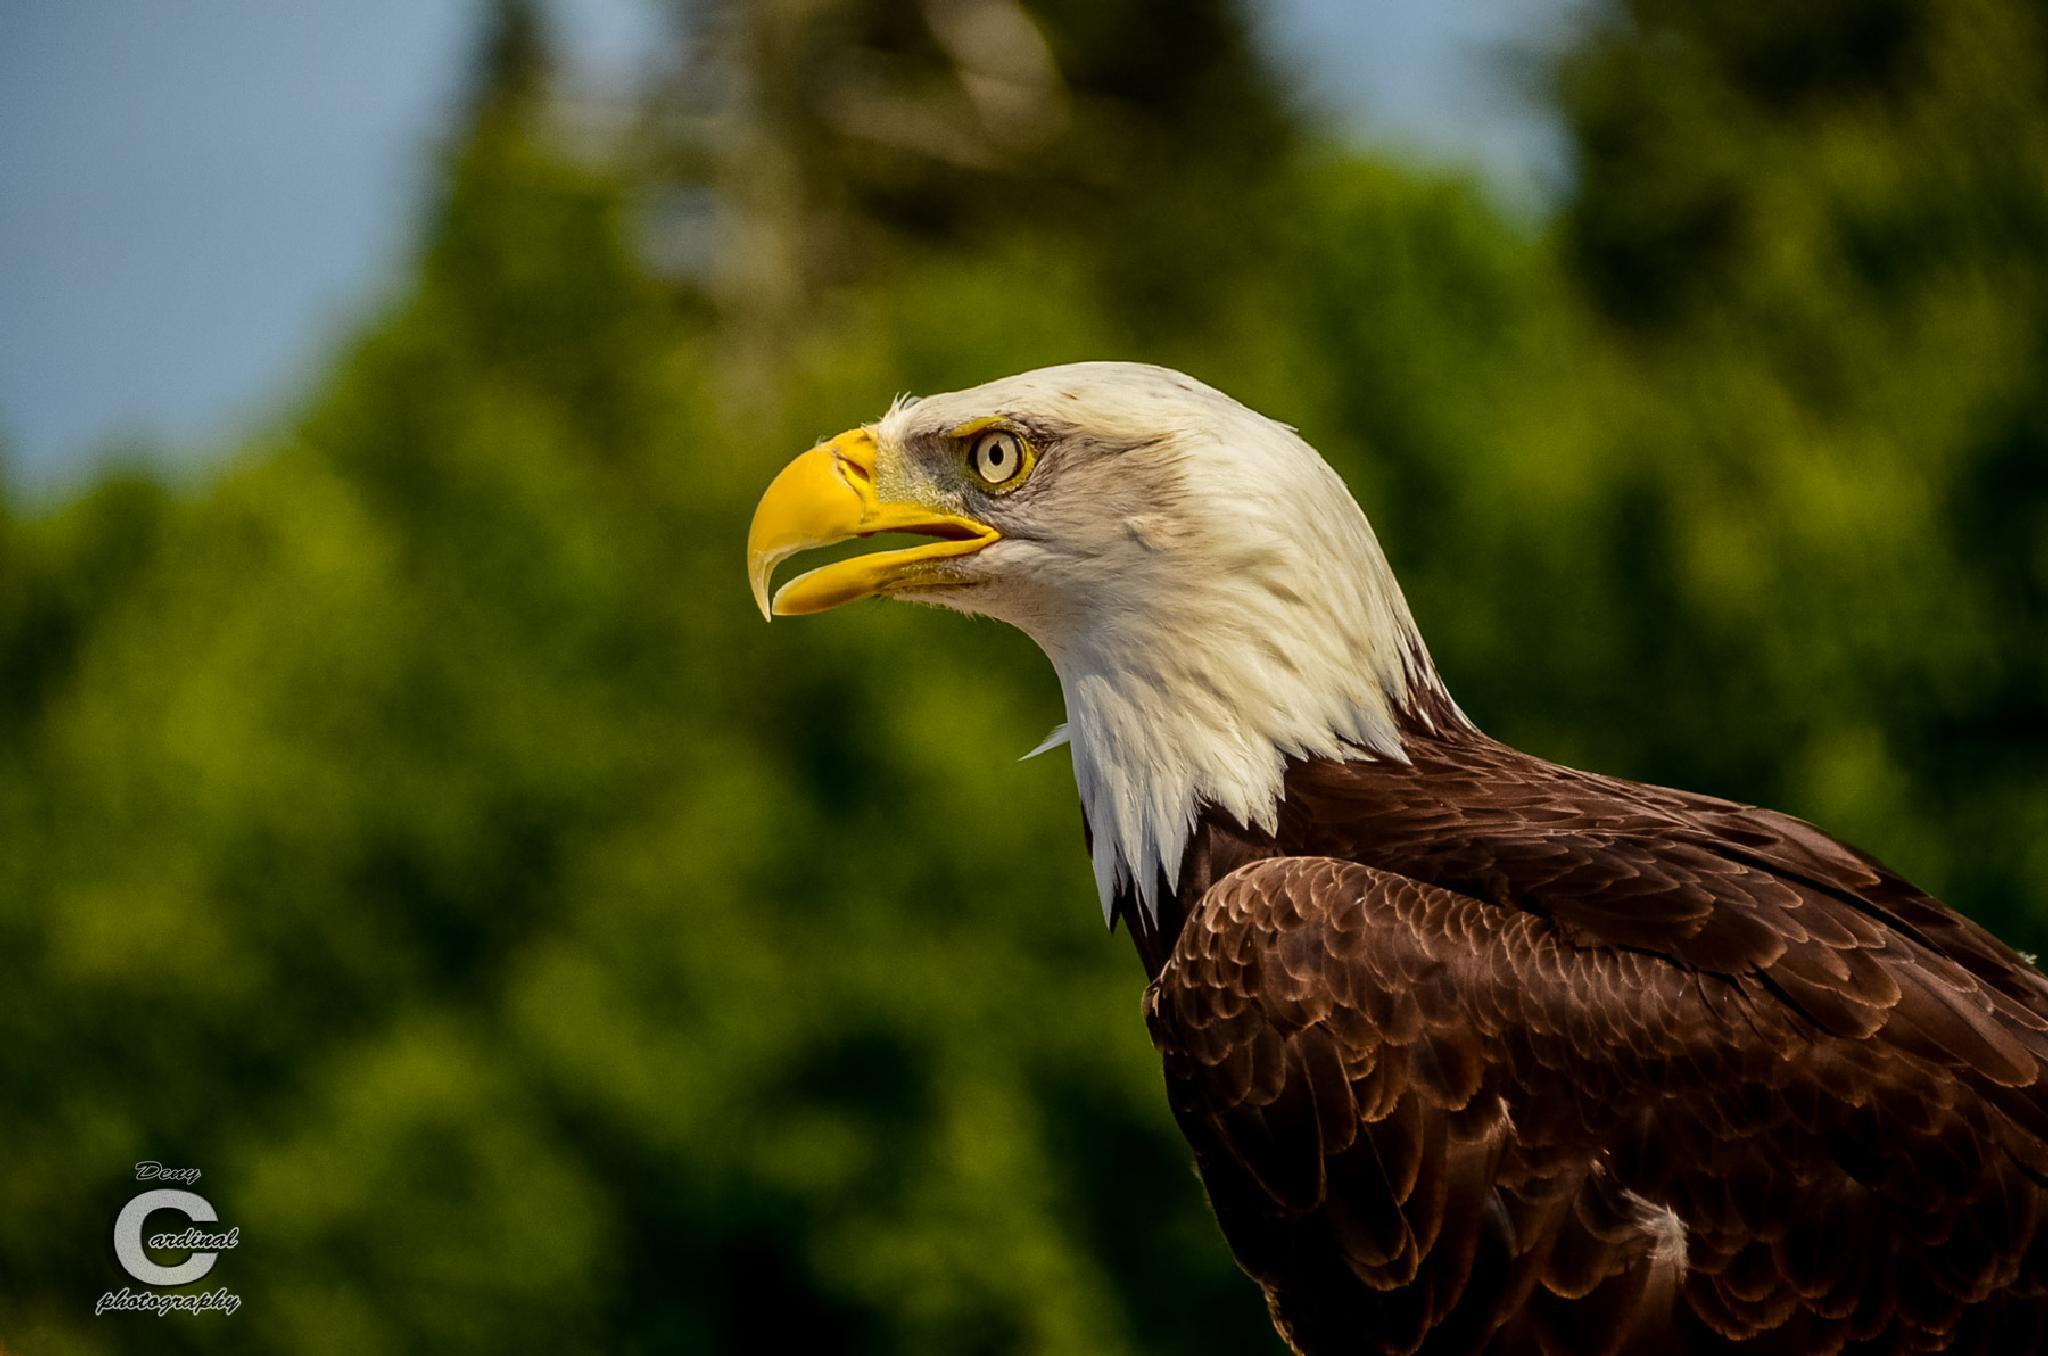 Bald Eagle by denycardinal